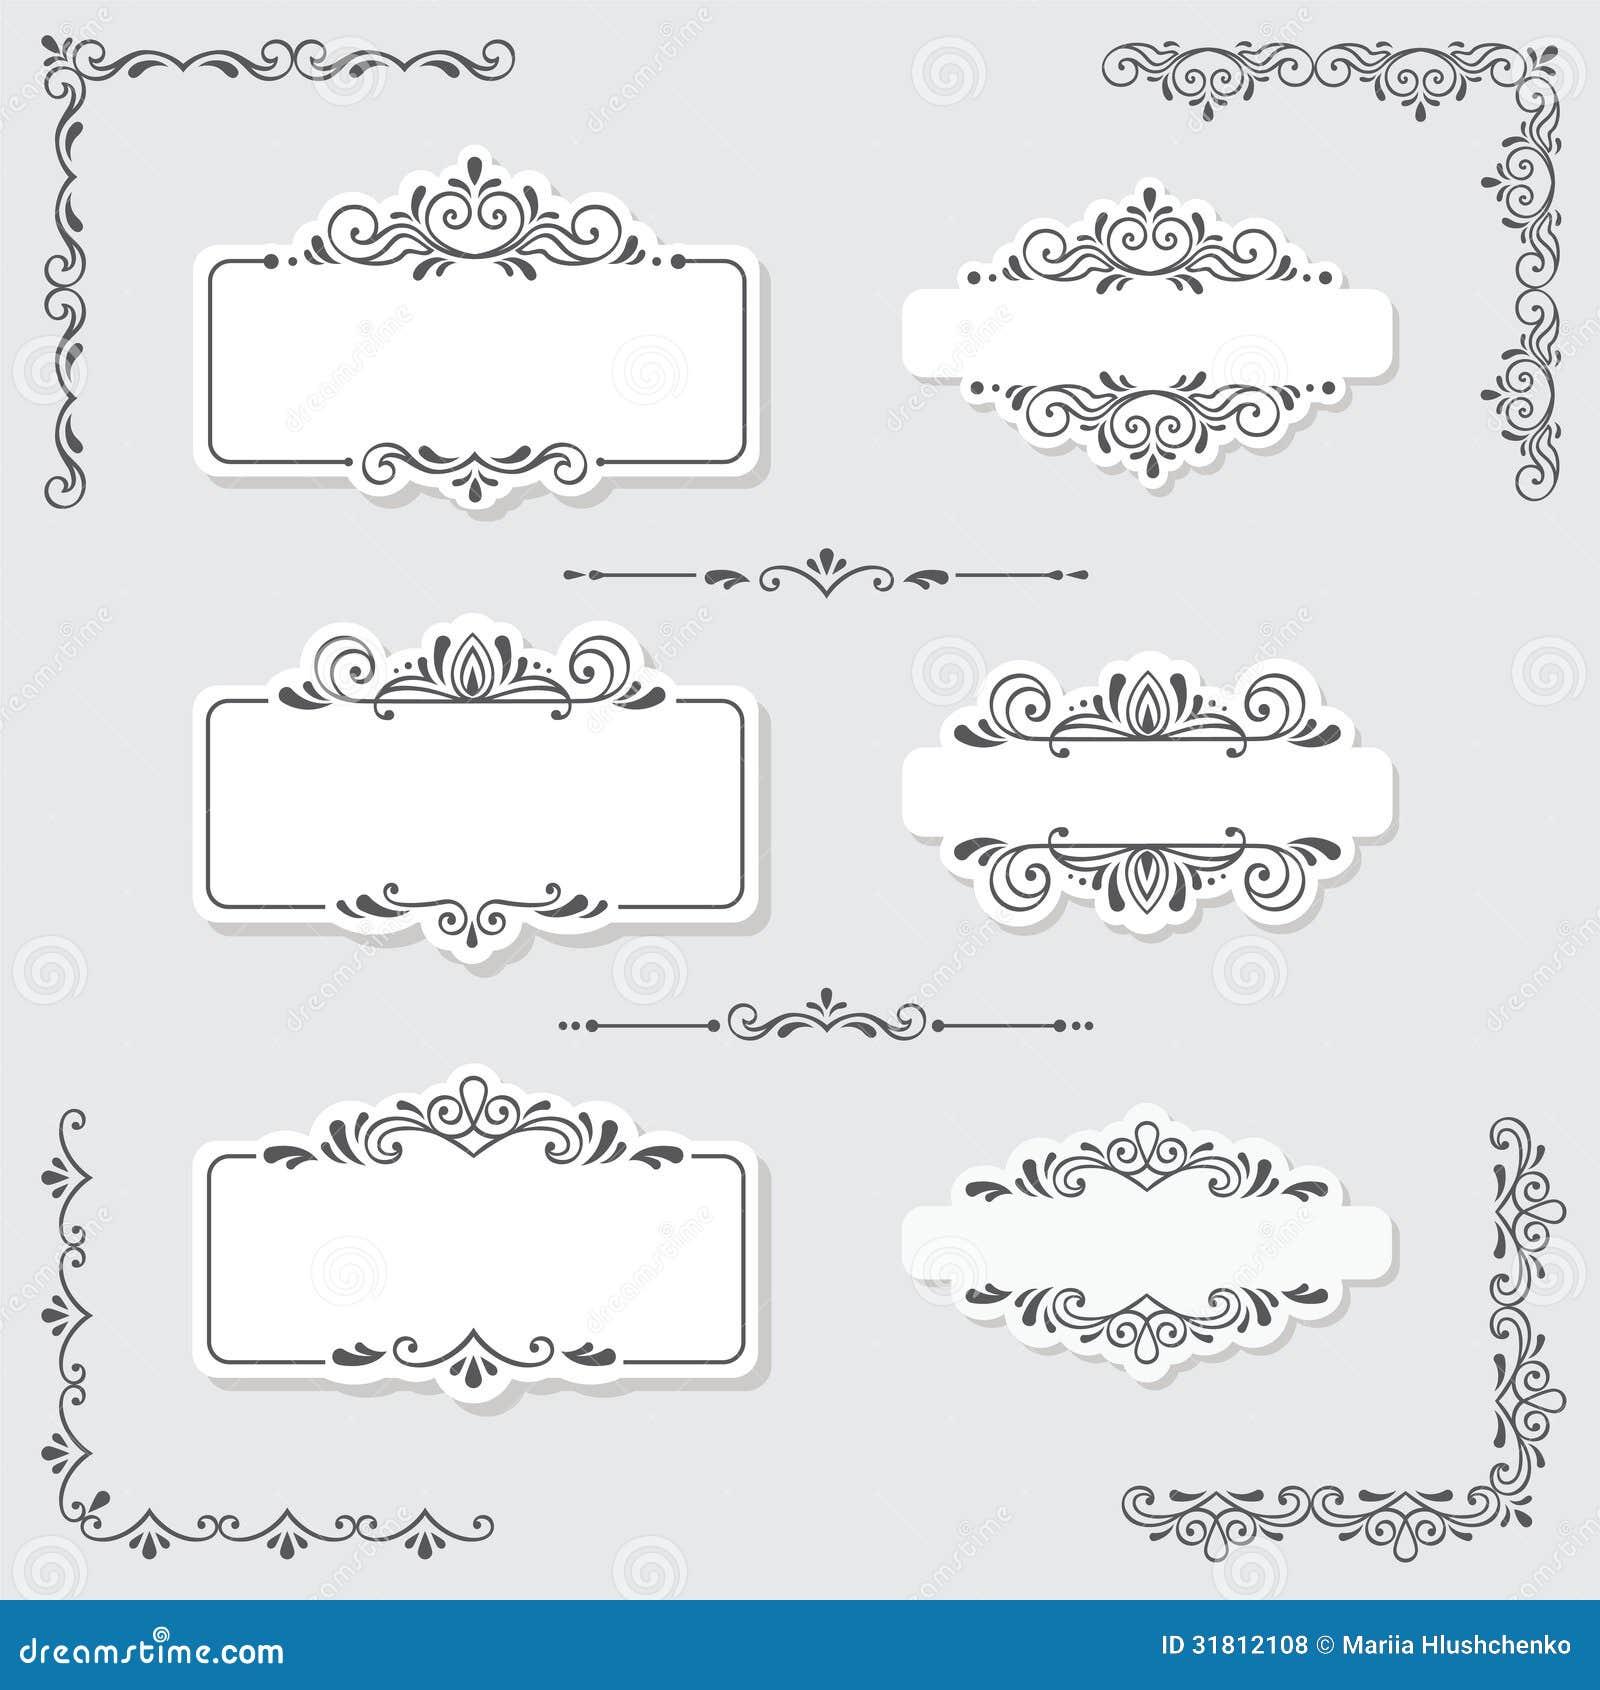 Vintage Design Elements Royalty Free Stock Photos - Image: 31812108